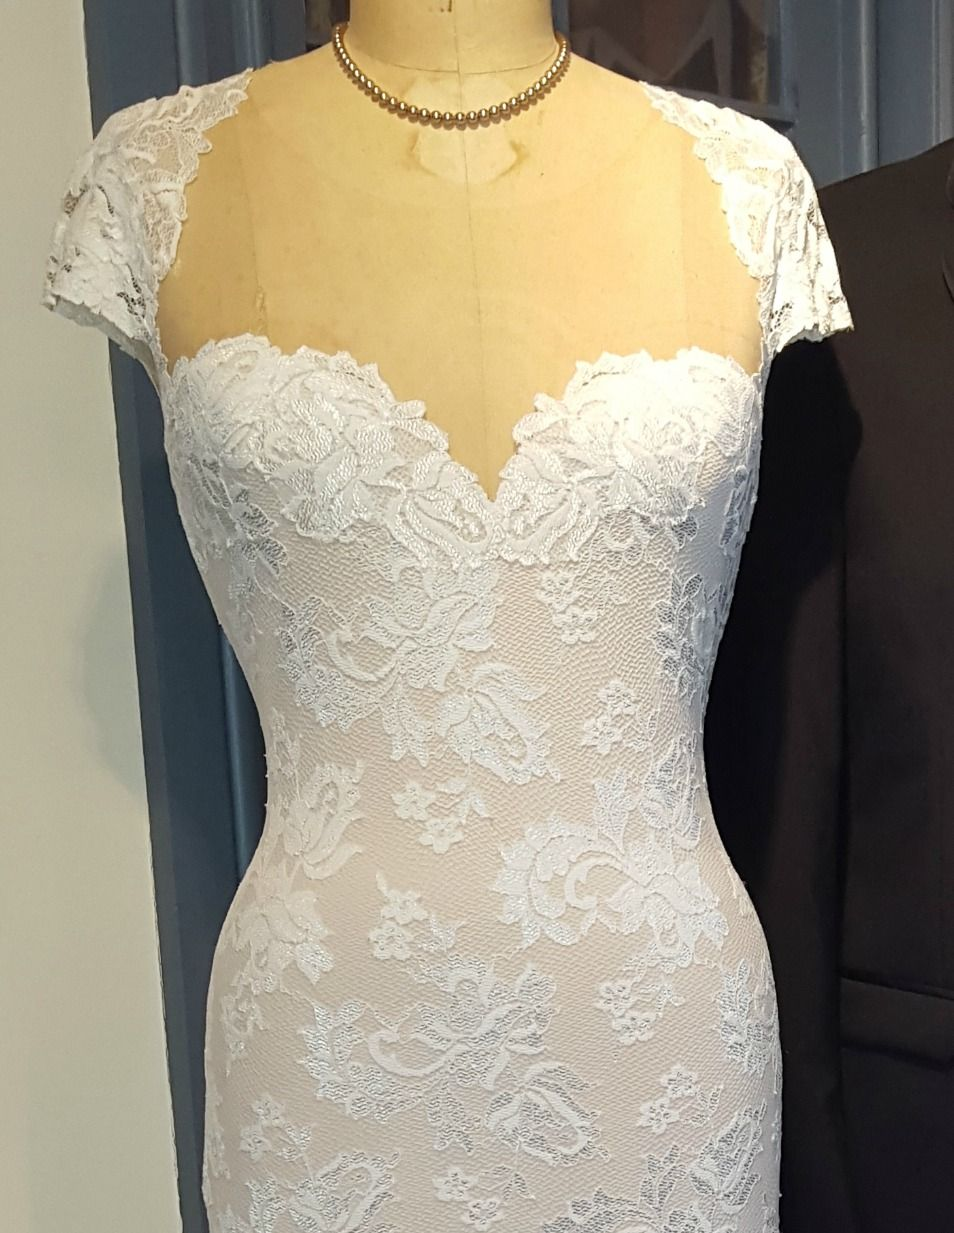 Olvi's Trend stretch lace bridal gown www.harleysvillebridal.com